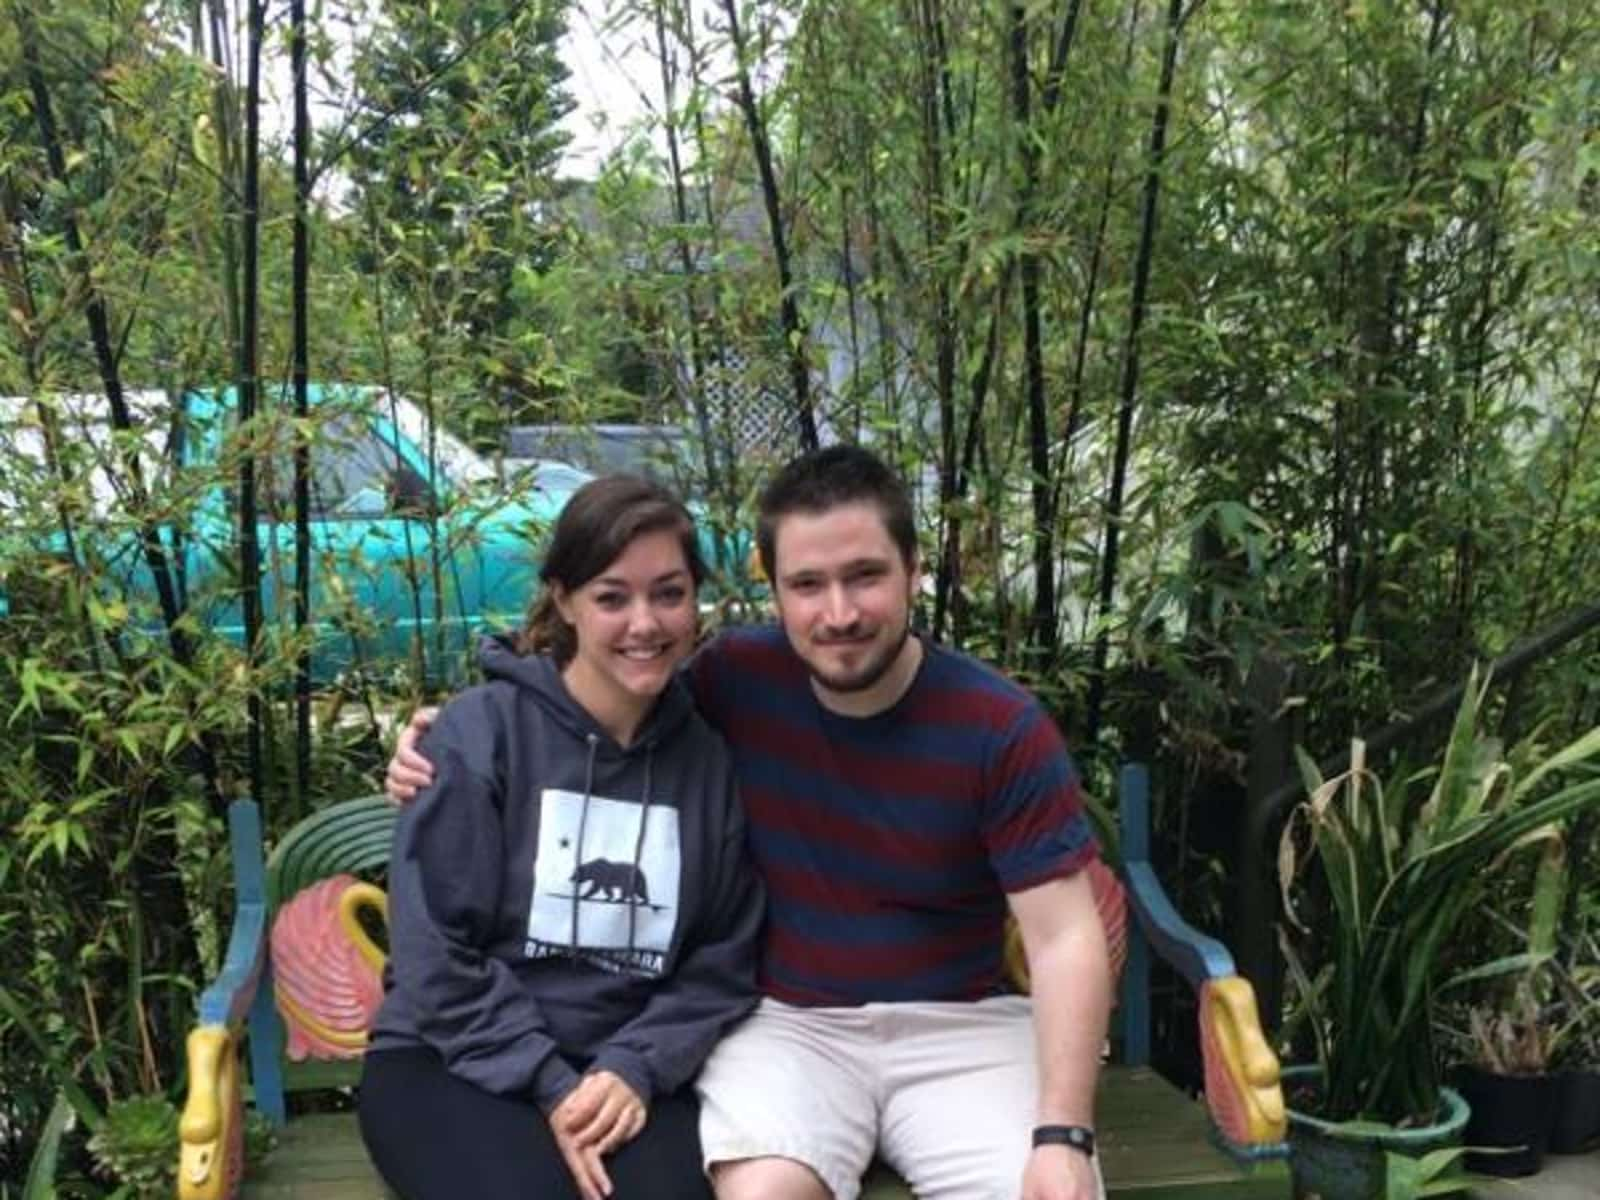 Jennifer & Jarrod from Boston, Massachusetts, United States